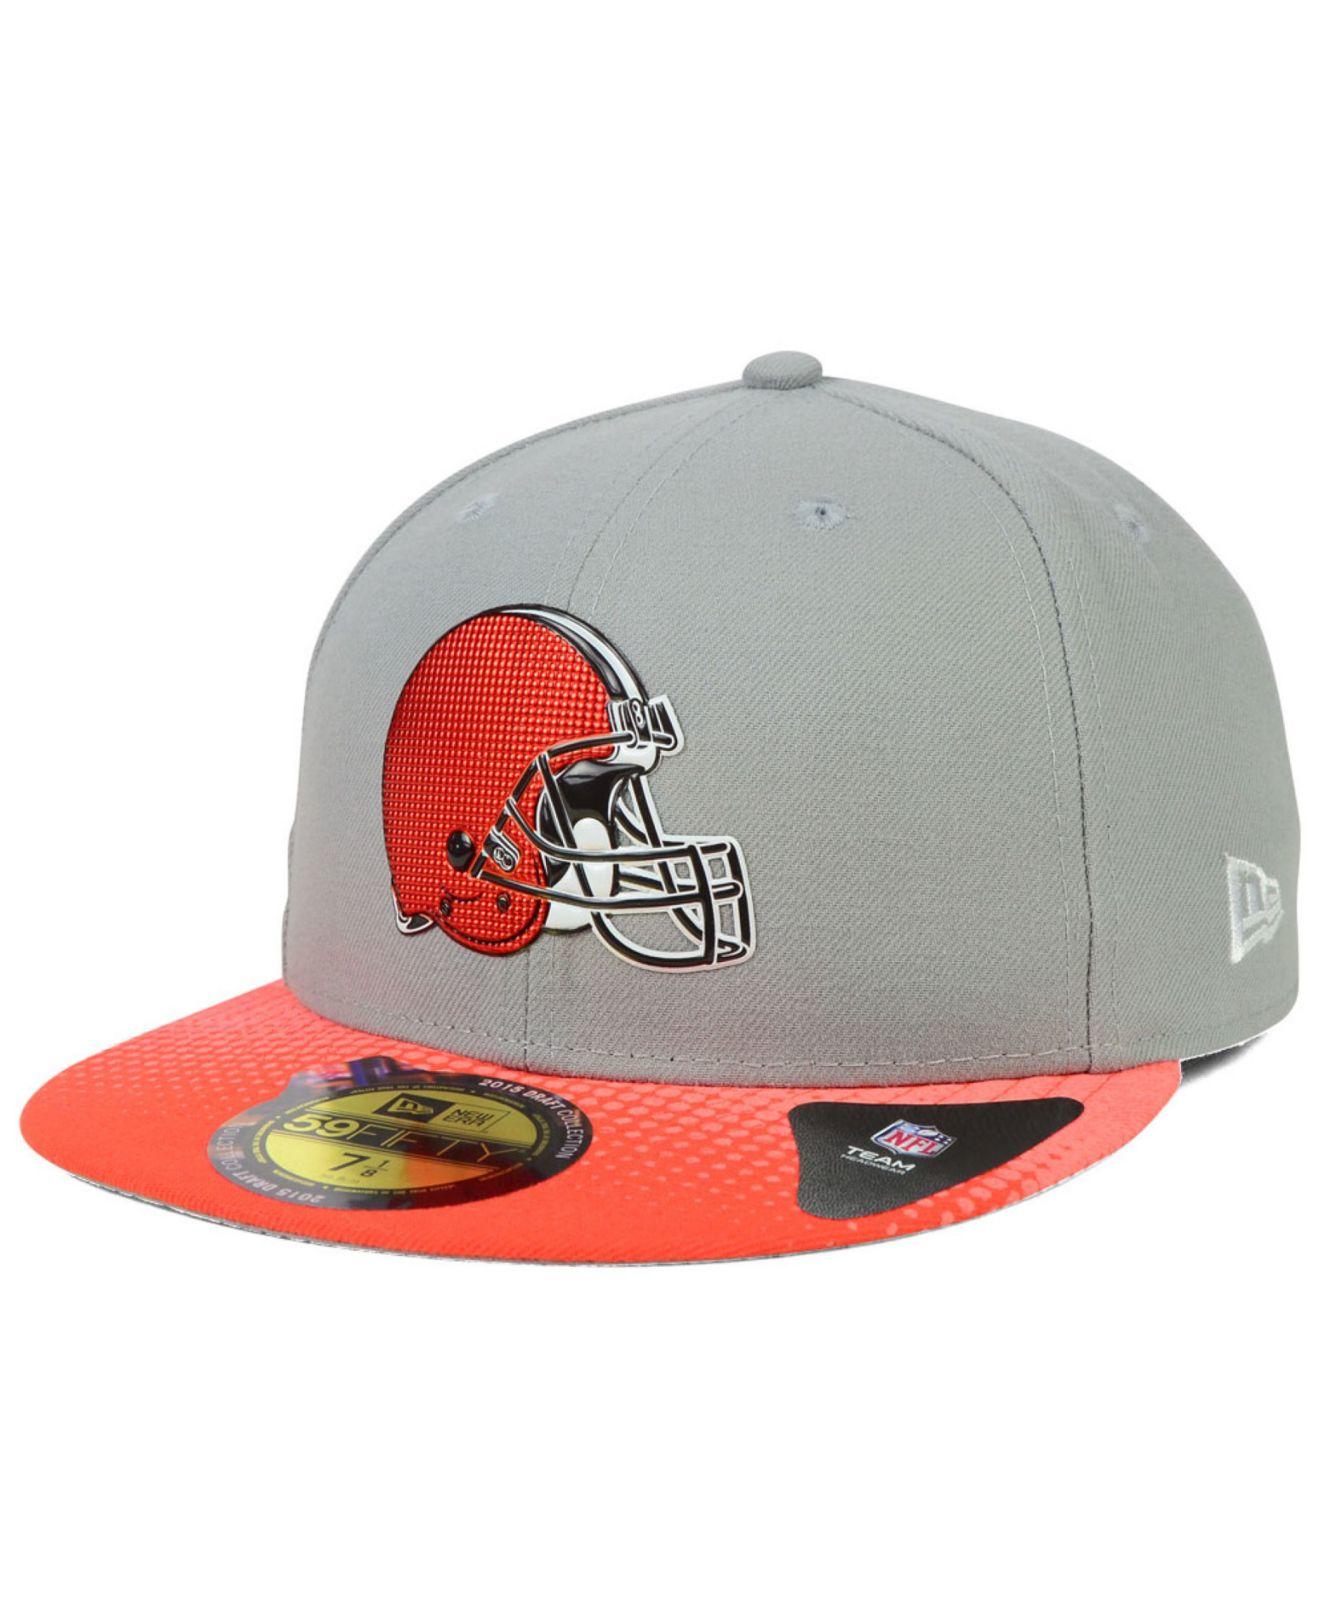 Men S Cleveland Browns New Era Gray 2015 Nfl Draft 59fifty